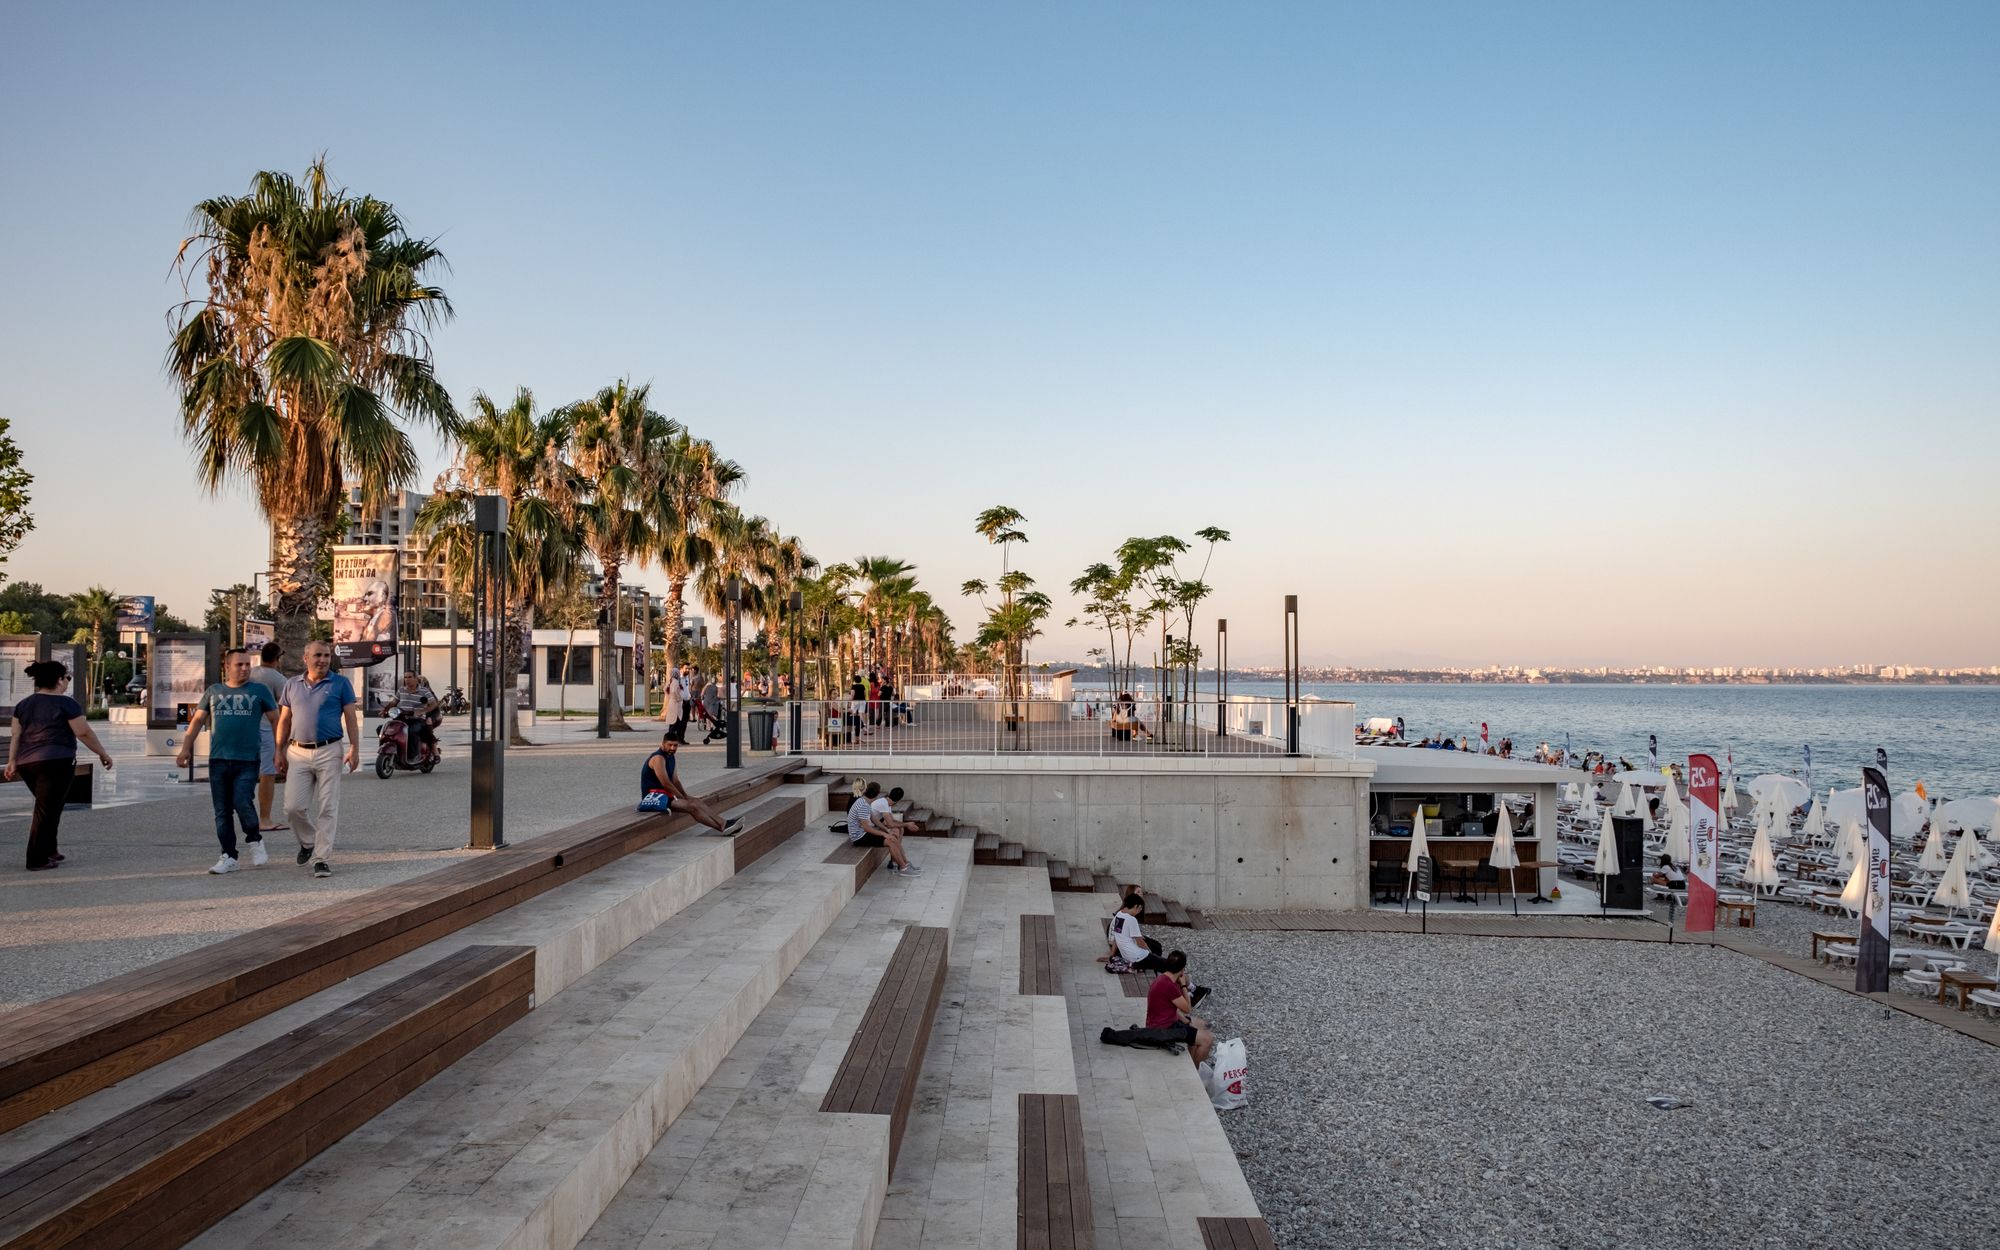 Gallery of Antalya Konyaalti Coastline Urban Rehabilitation / OZER/URGER Architects - 1